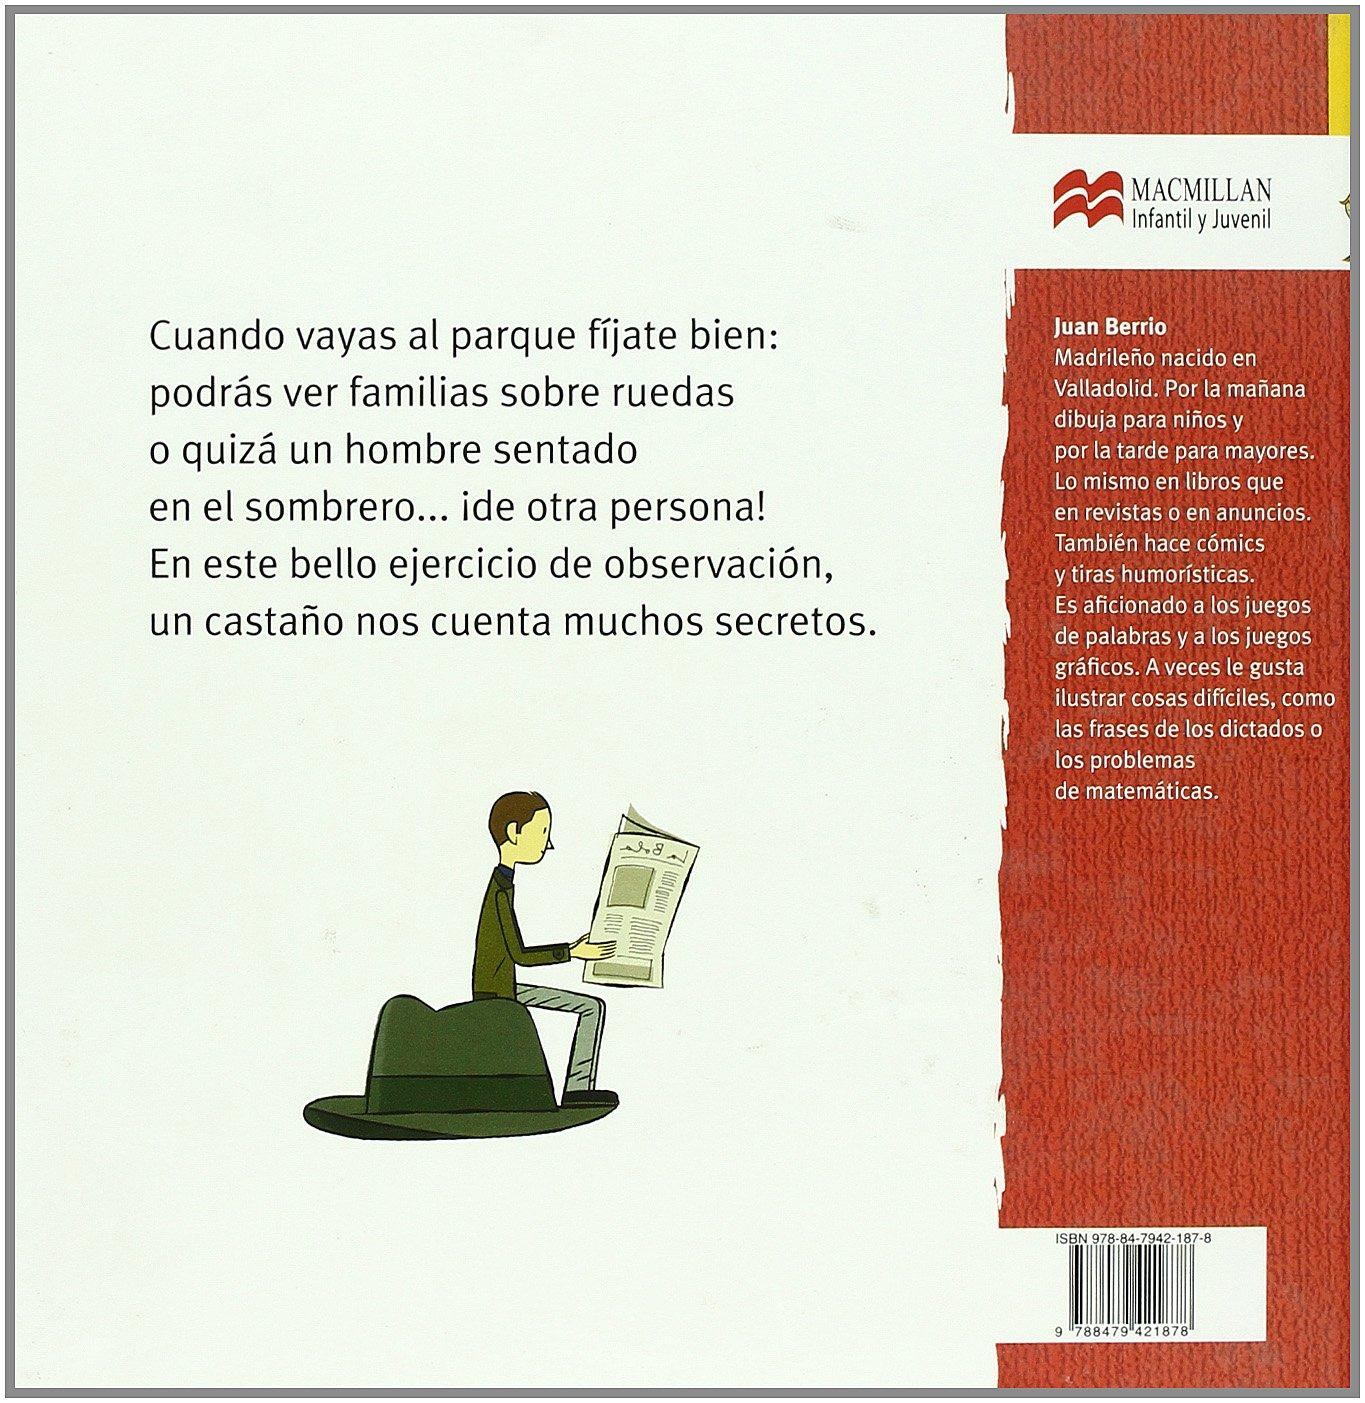 Amazon.com: El castaño (Librosaurio) (Spanish Edition) (9788479421878): Juan Berrio: Books